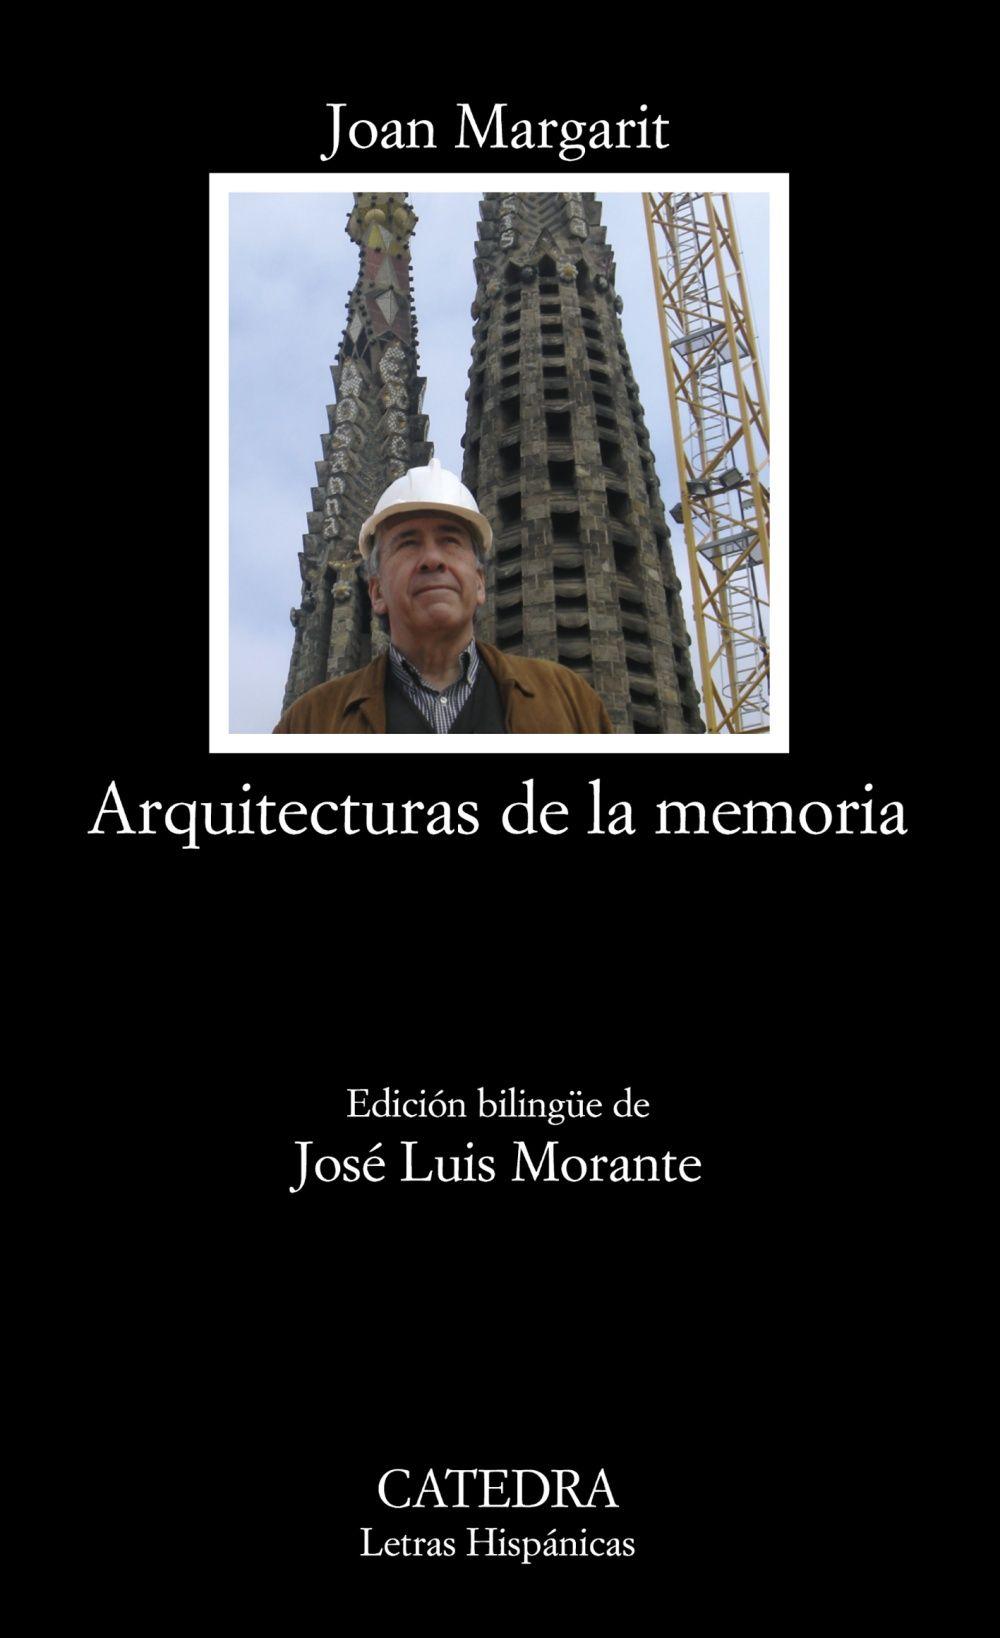 ARQUITECTURAS DE LA MEMORIA